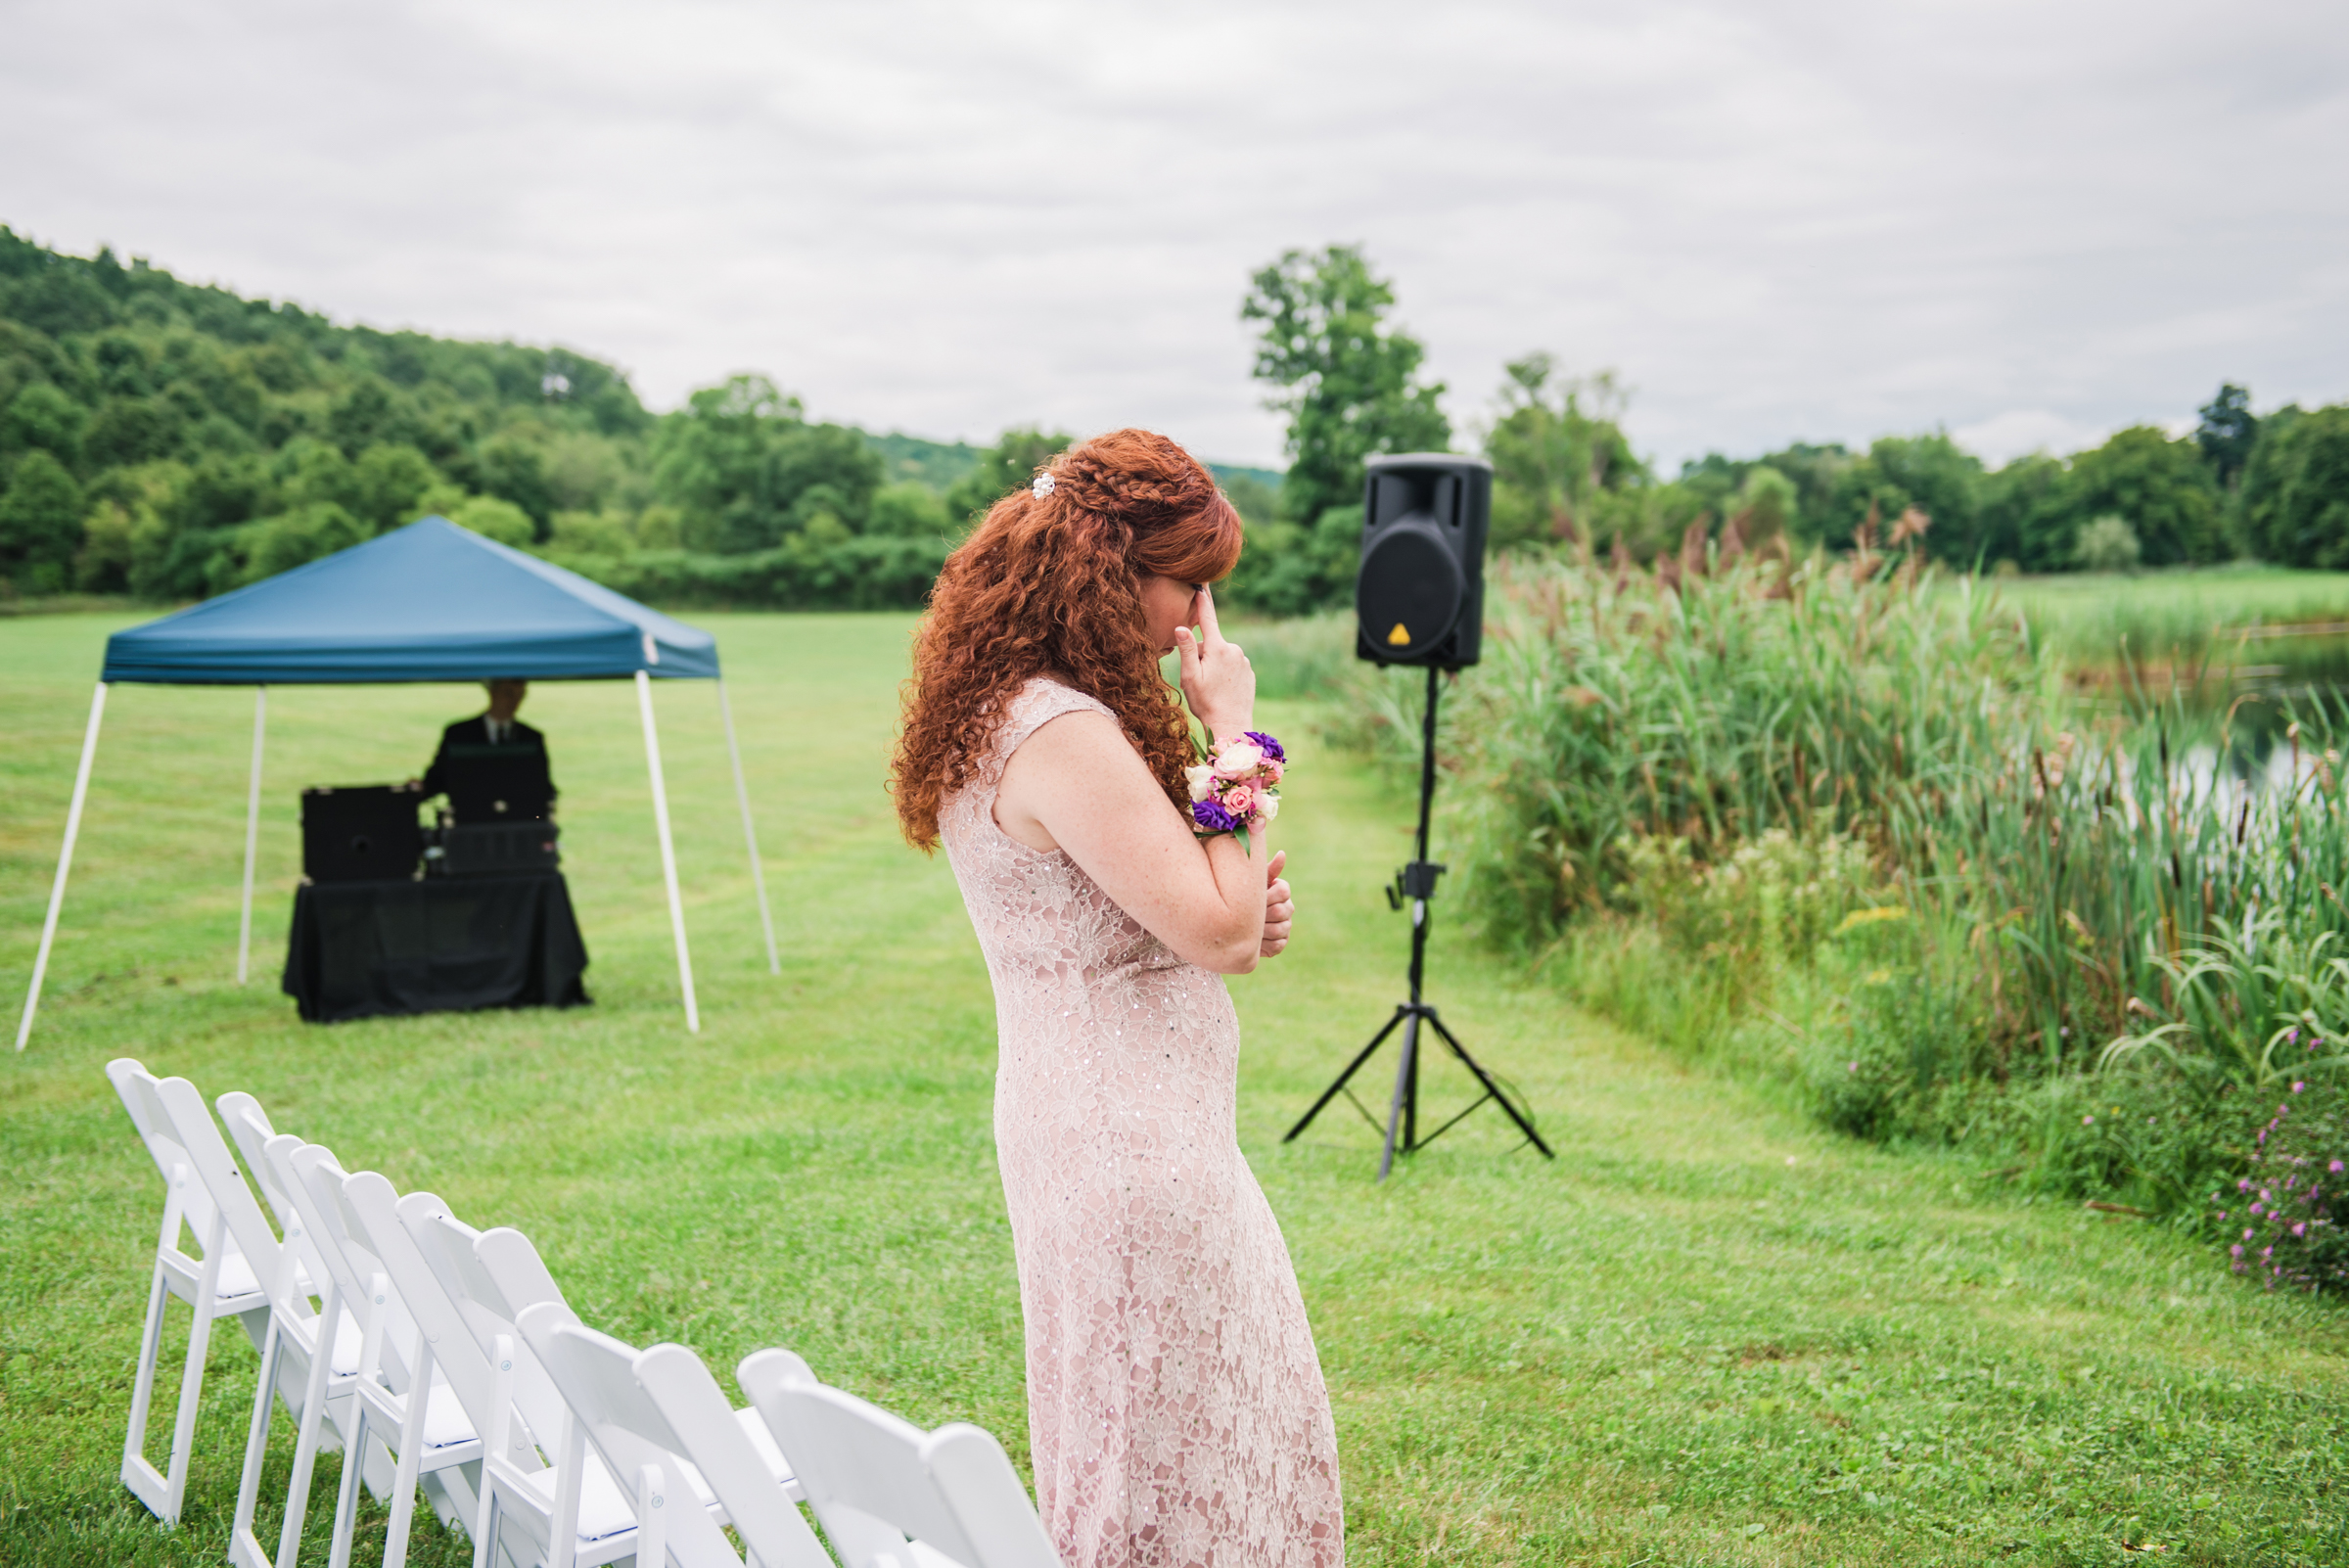 Wolf_Oak_Acres_Central_NY_Wedding_JILL_STUDIO_Rochester_NY_Photographer_DSC_8460.jpg